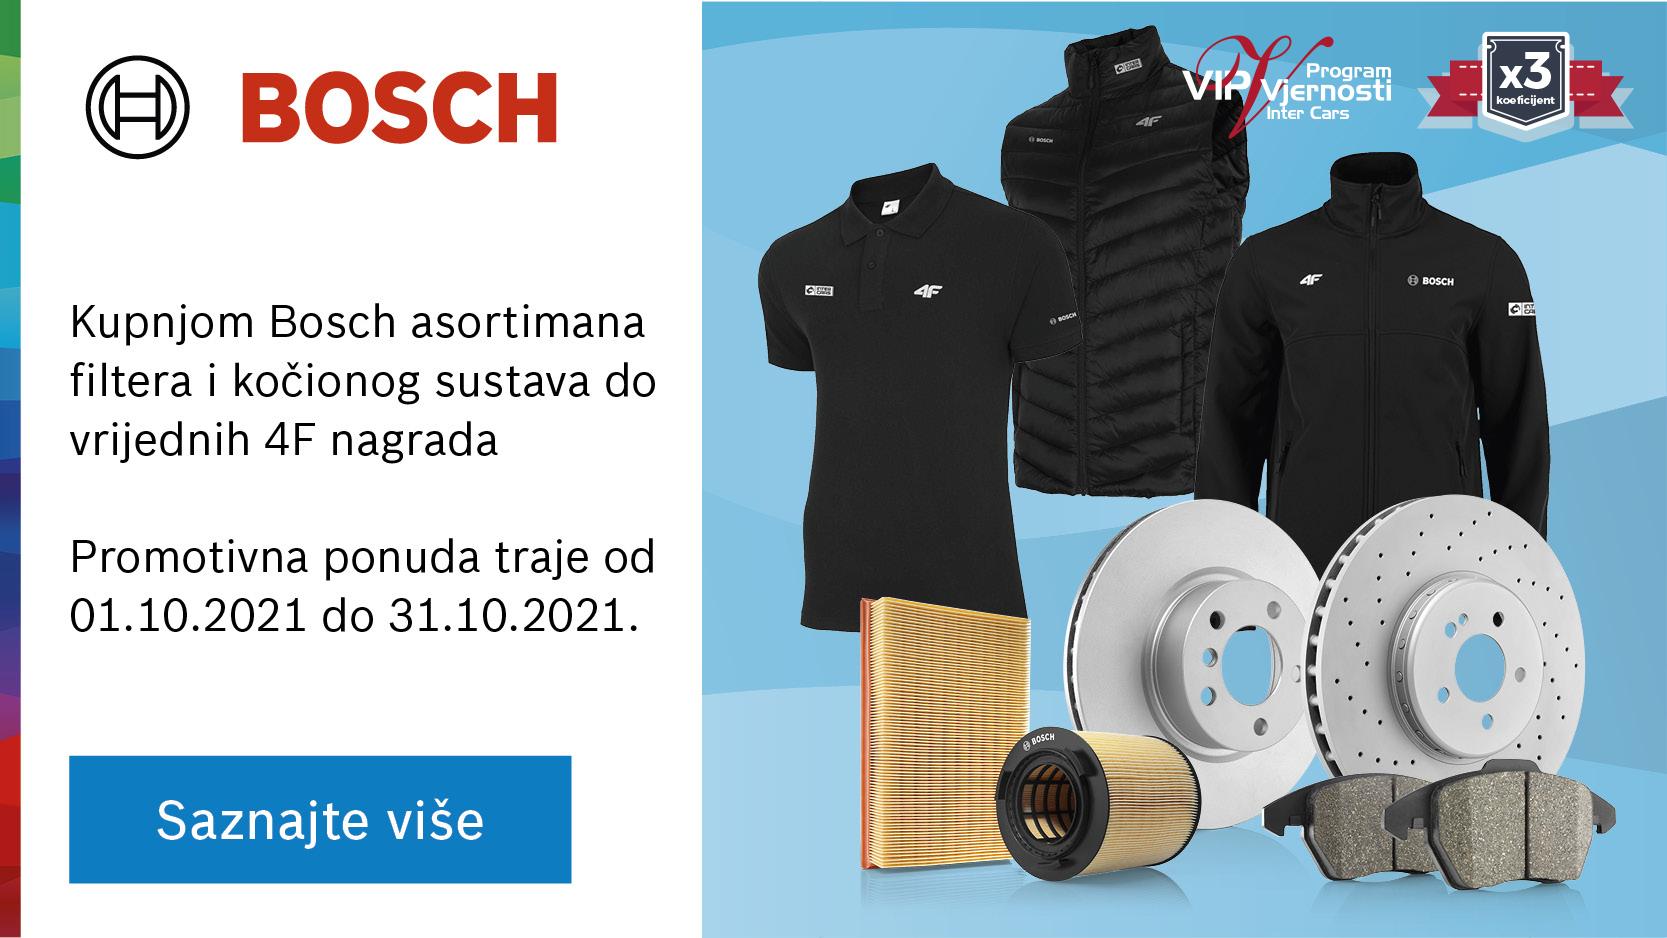 bosch_banner_web_800x450px.jpg